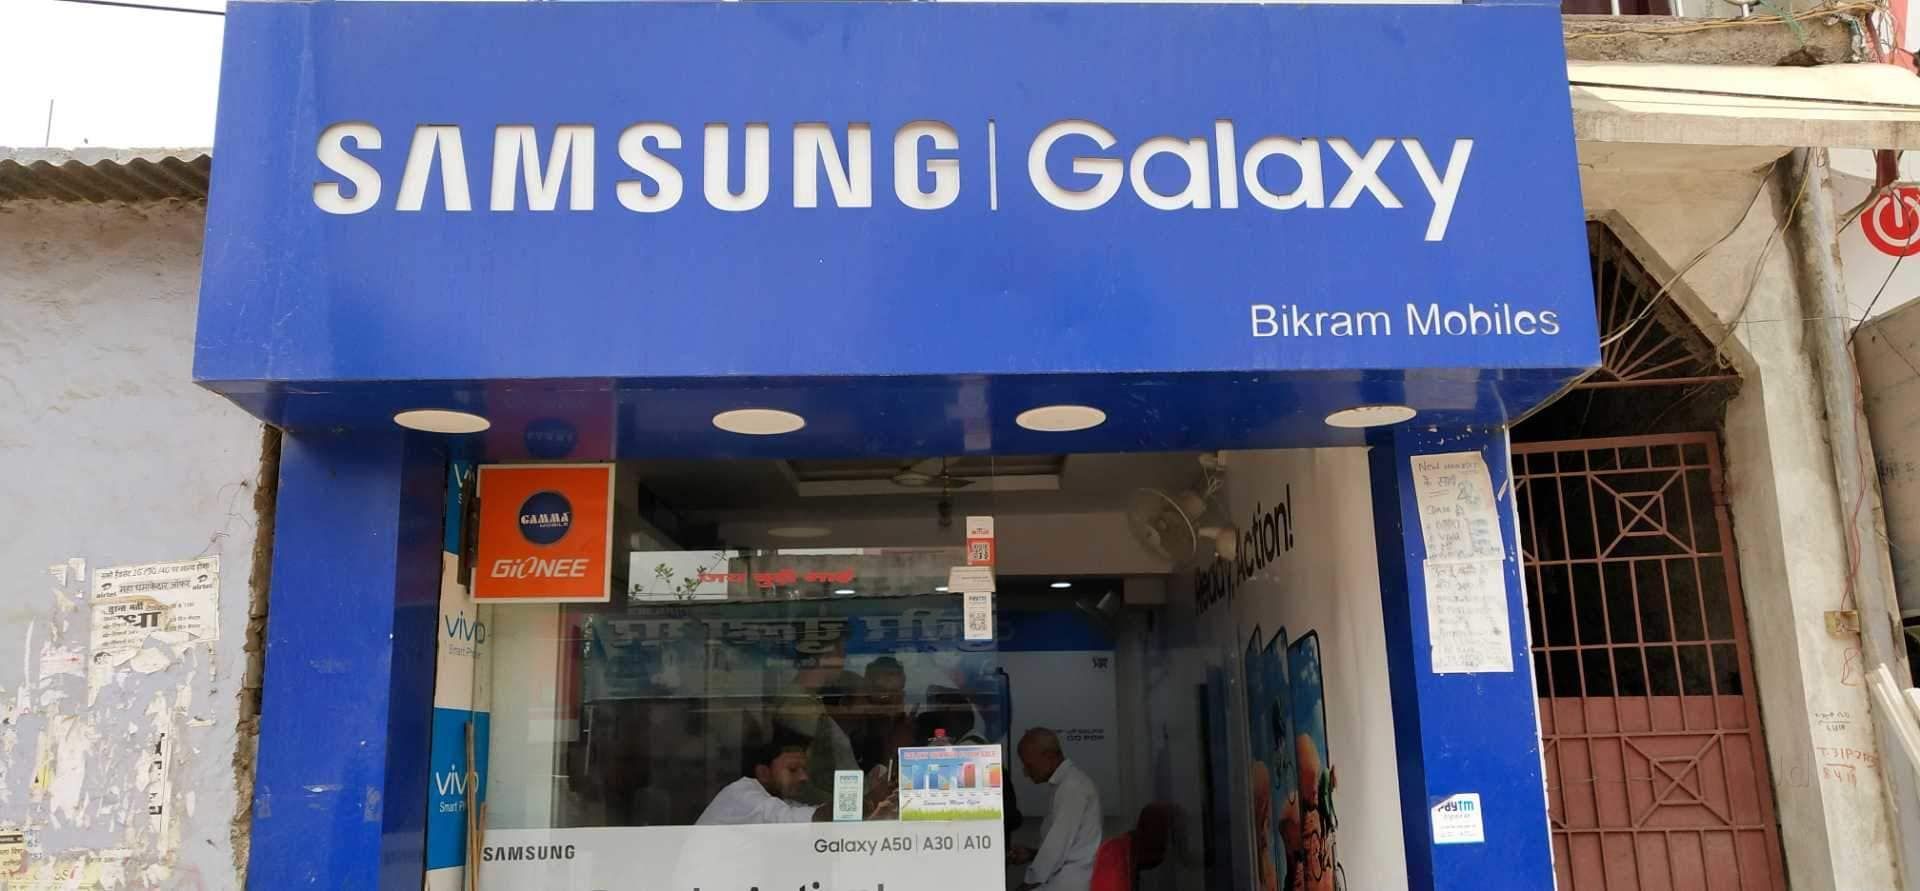 Top Mi Phone Stores in Madhubani - Best Mi Mobile Phones Stores